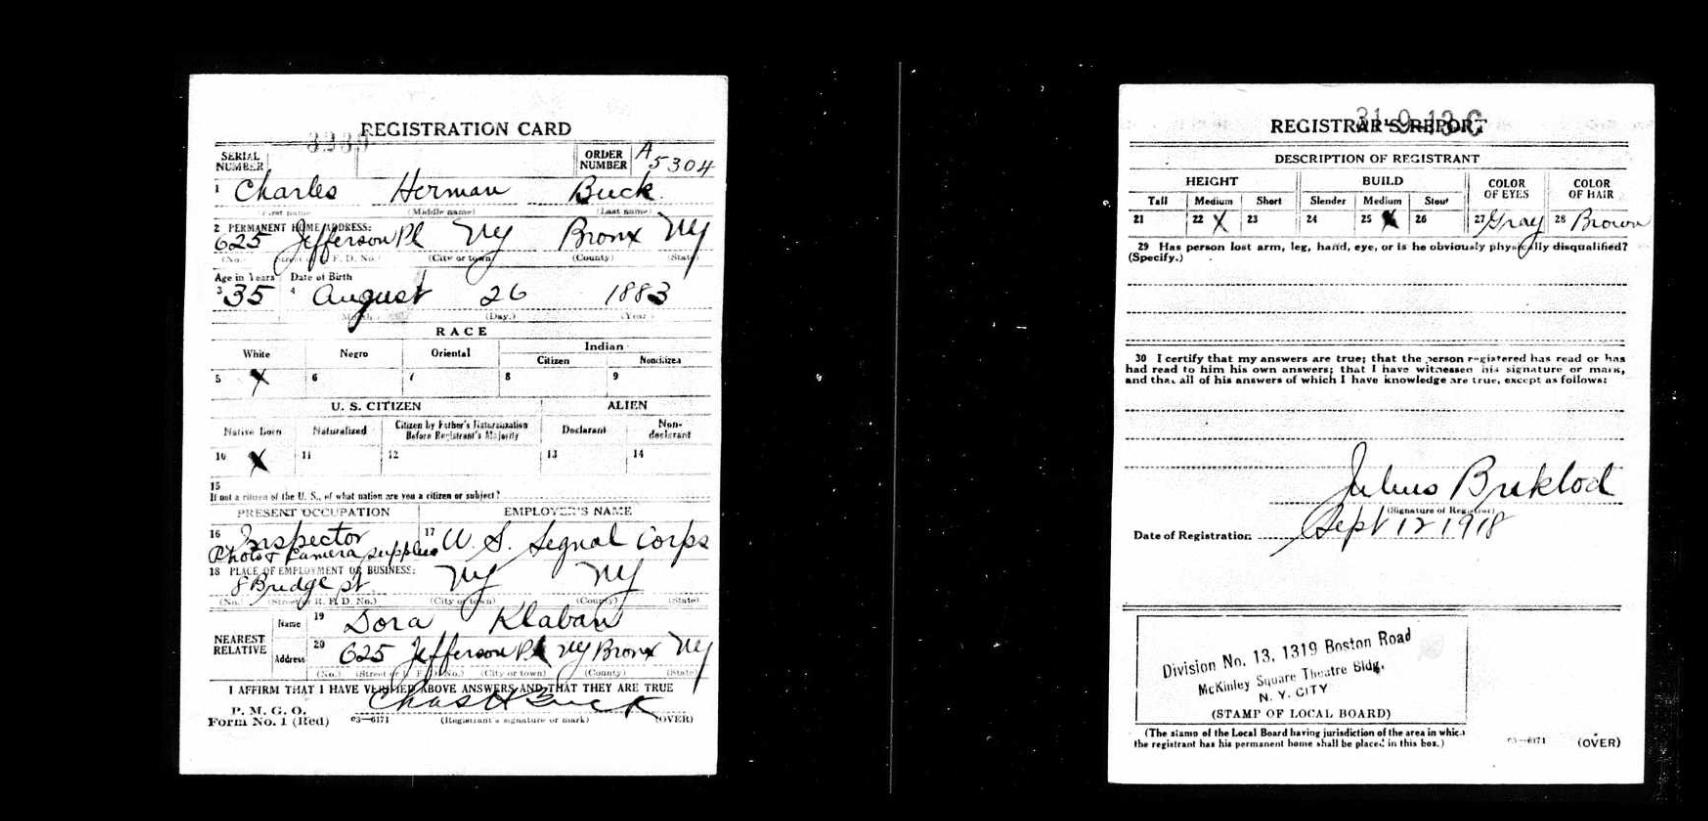 Charles H. Buck Draft Card